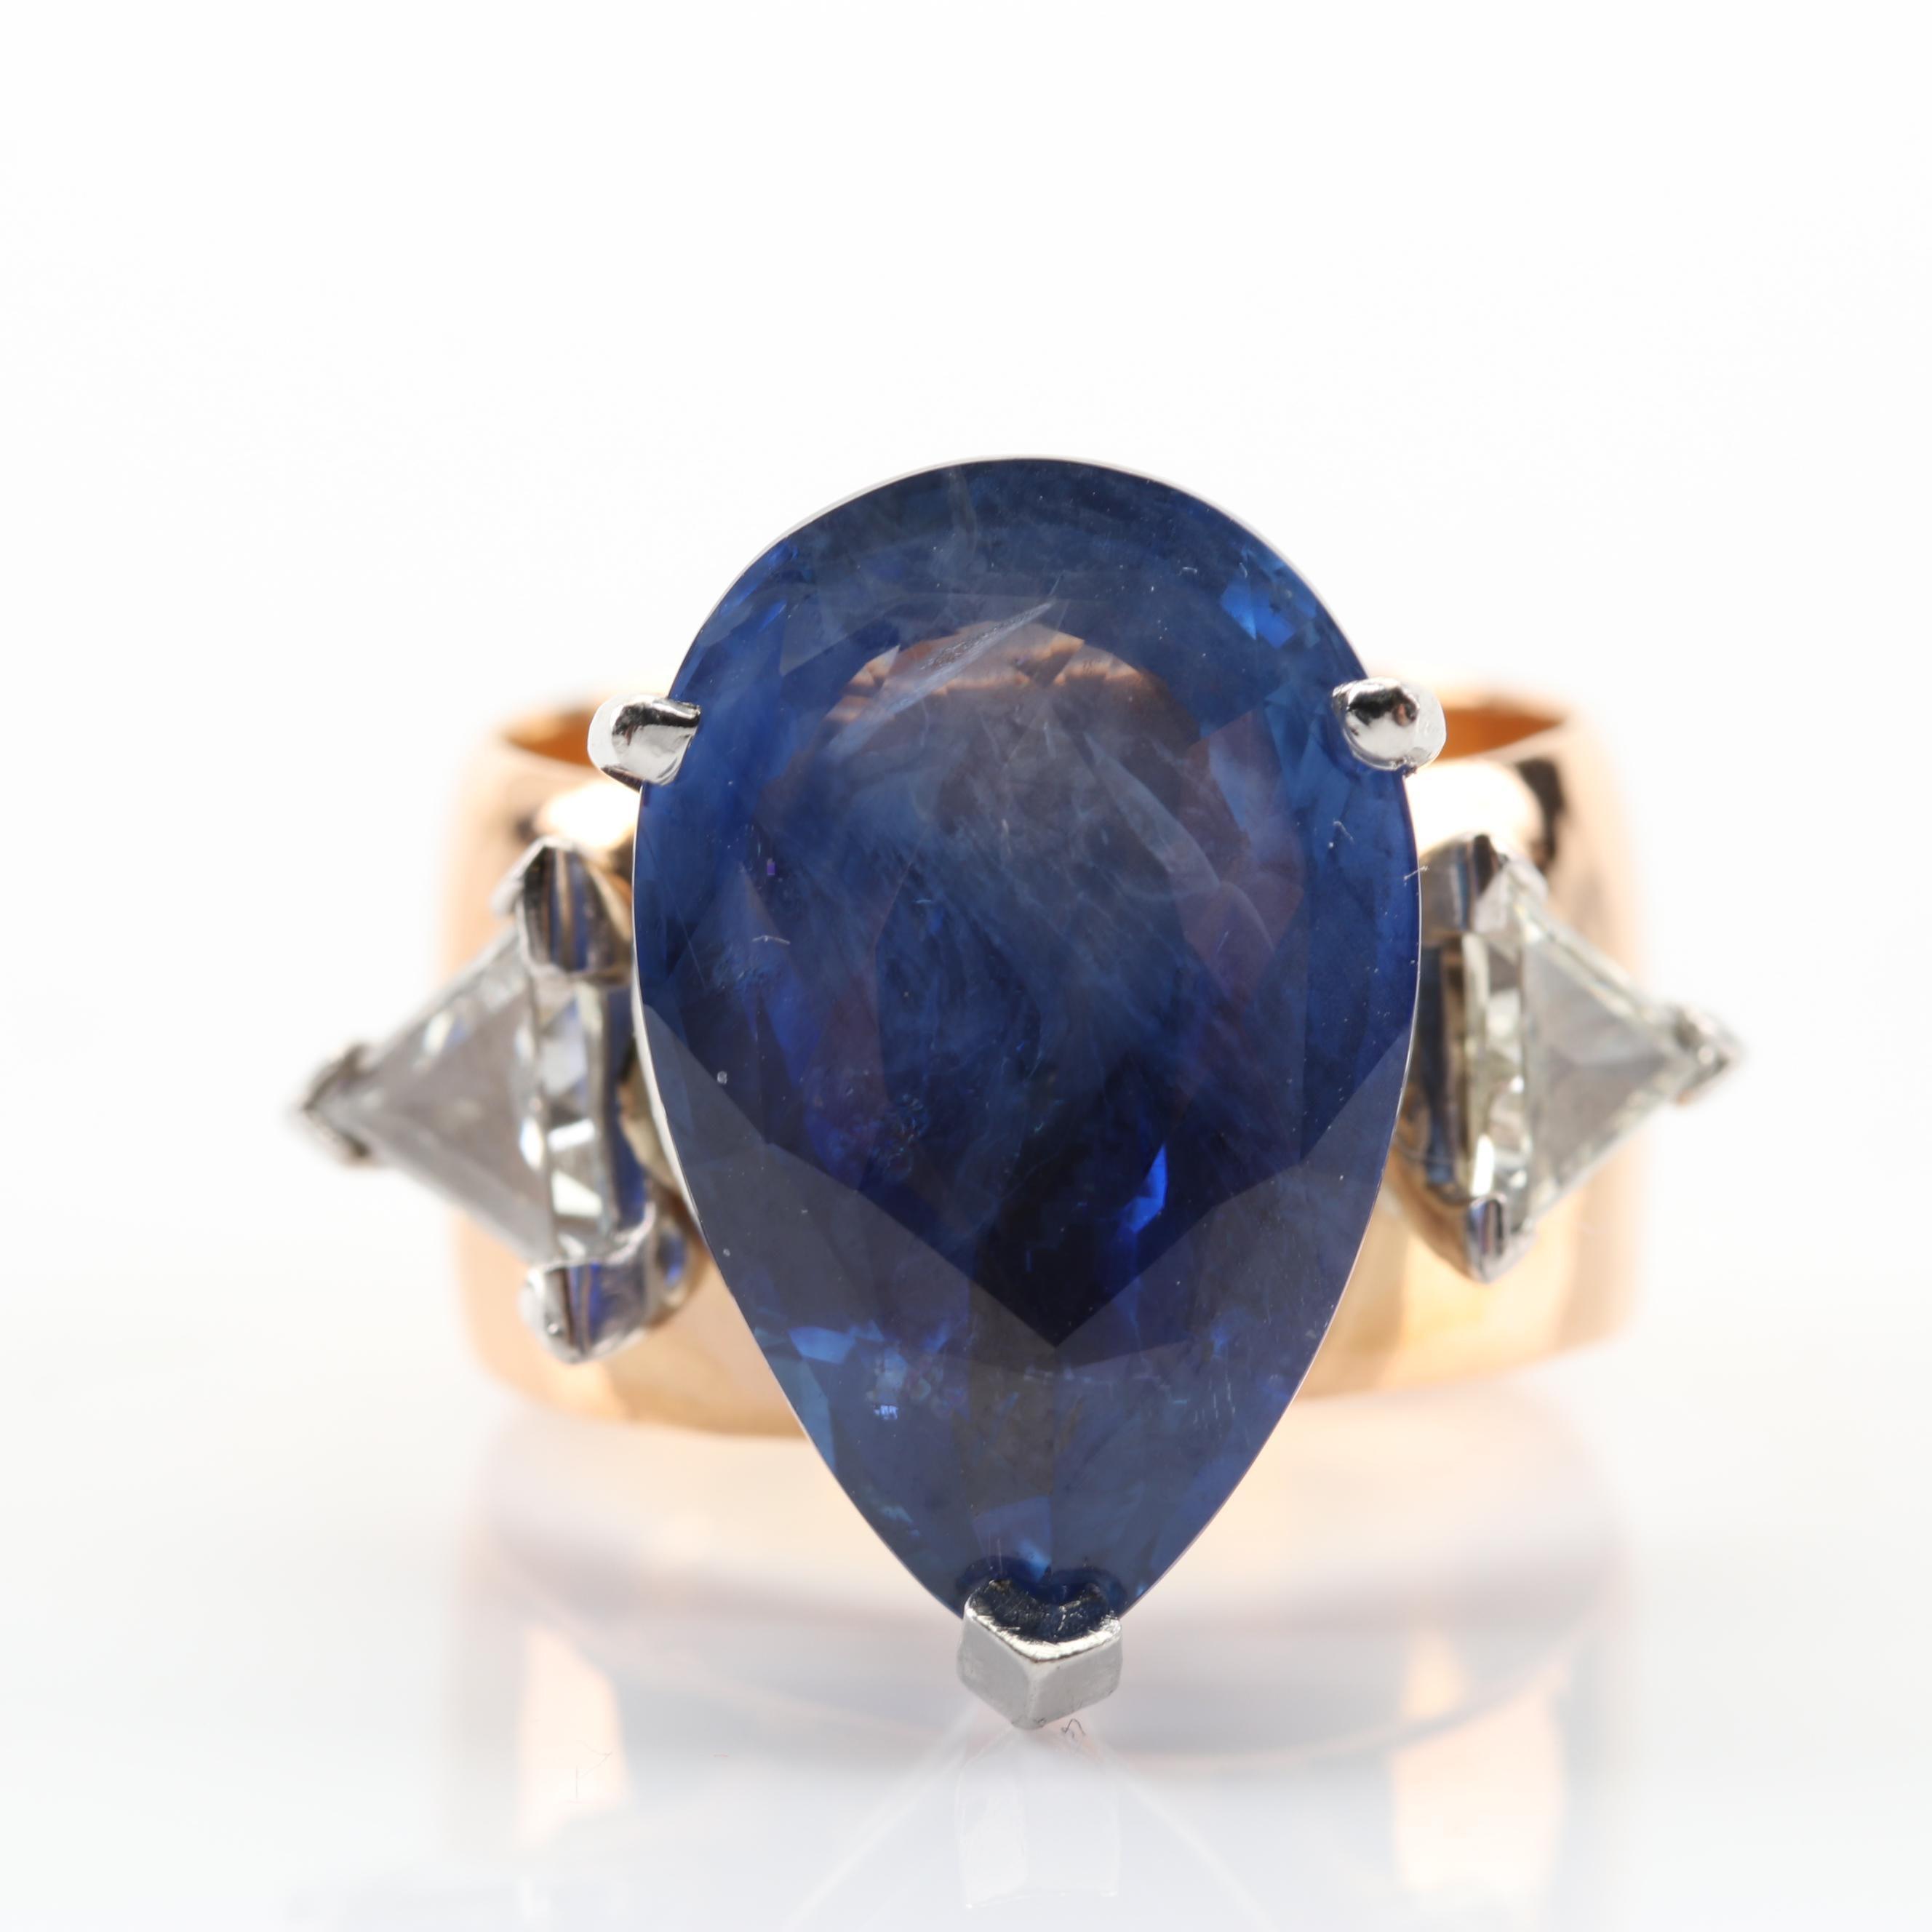 Samuel Hope 18K Yellow Gold 10.13 CT Sapphire and 1.00 CTW Diamond Ring